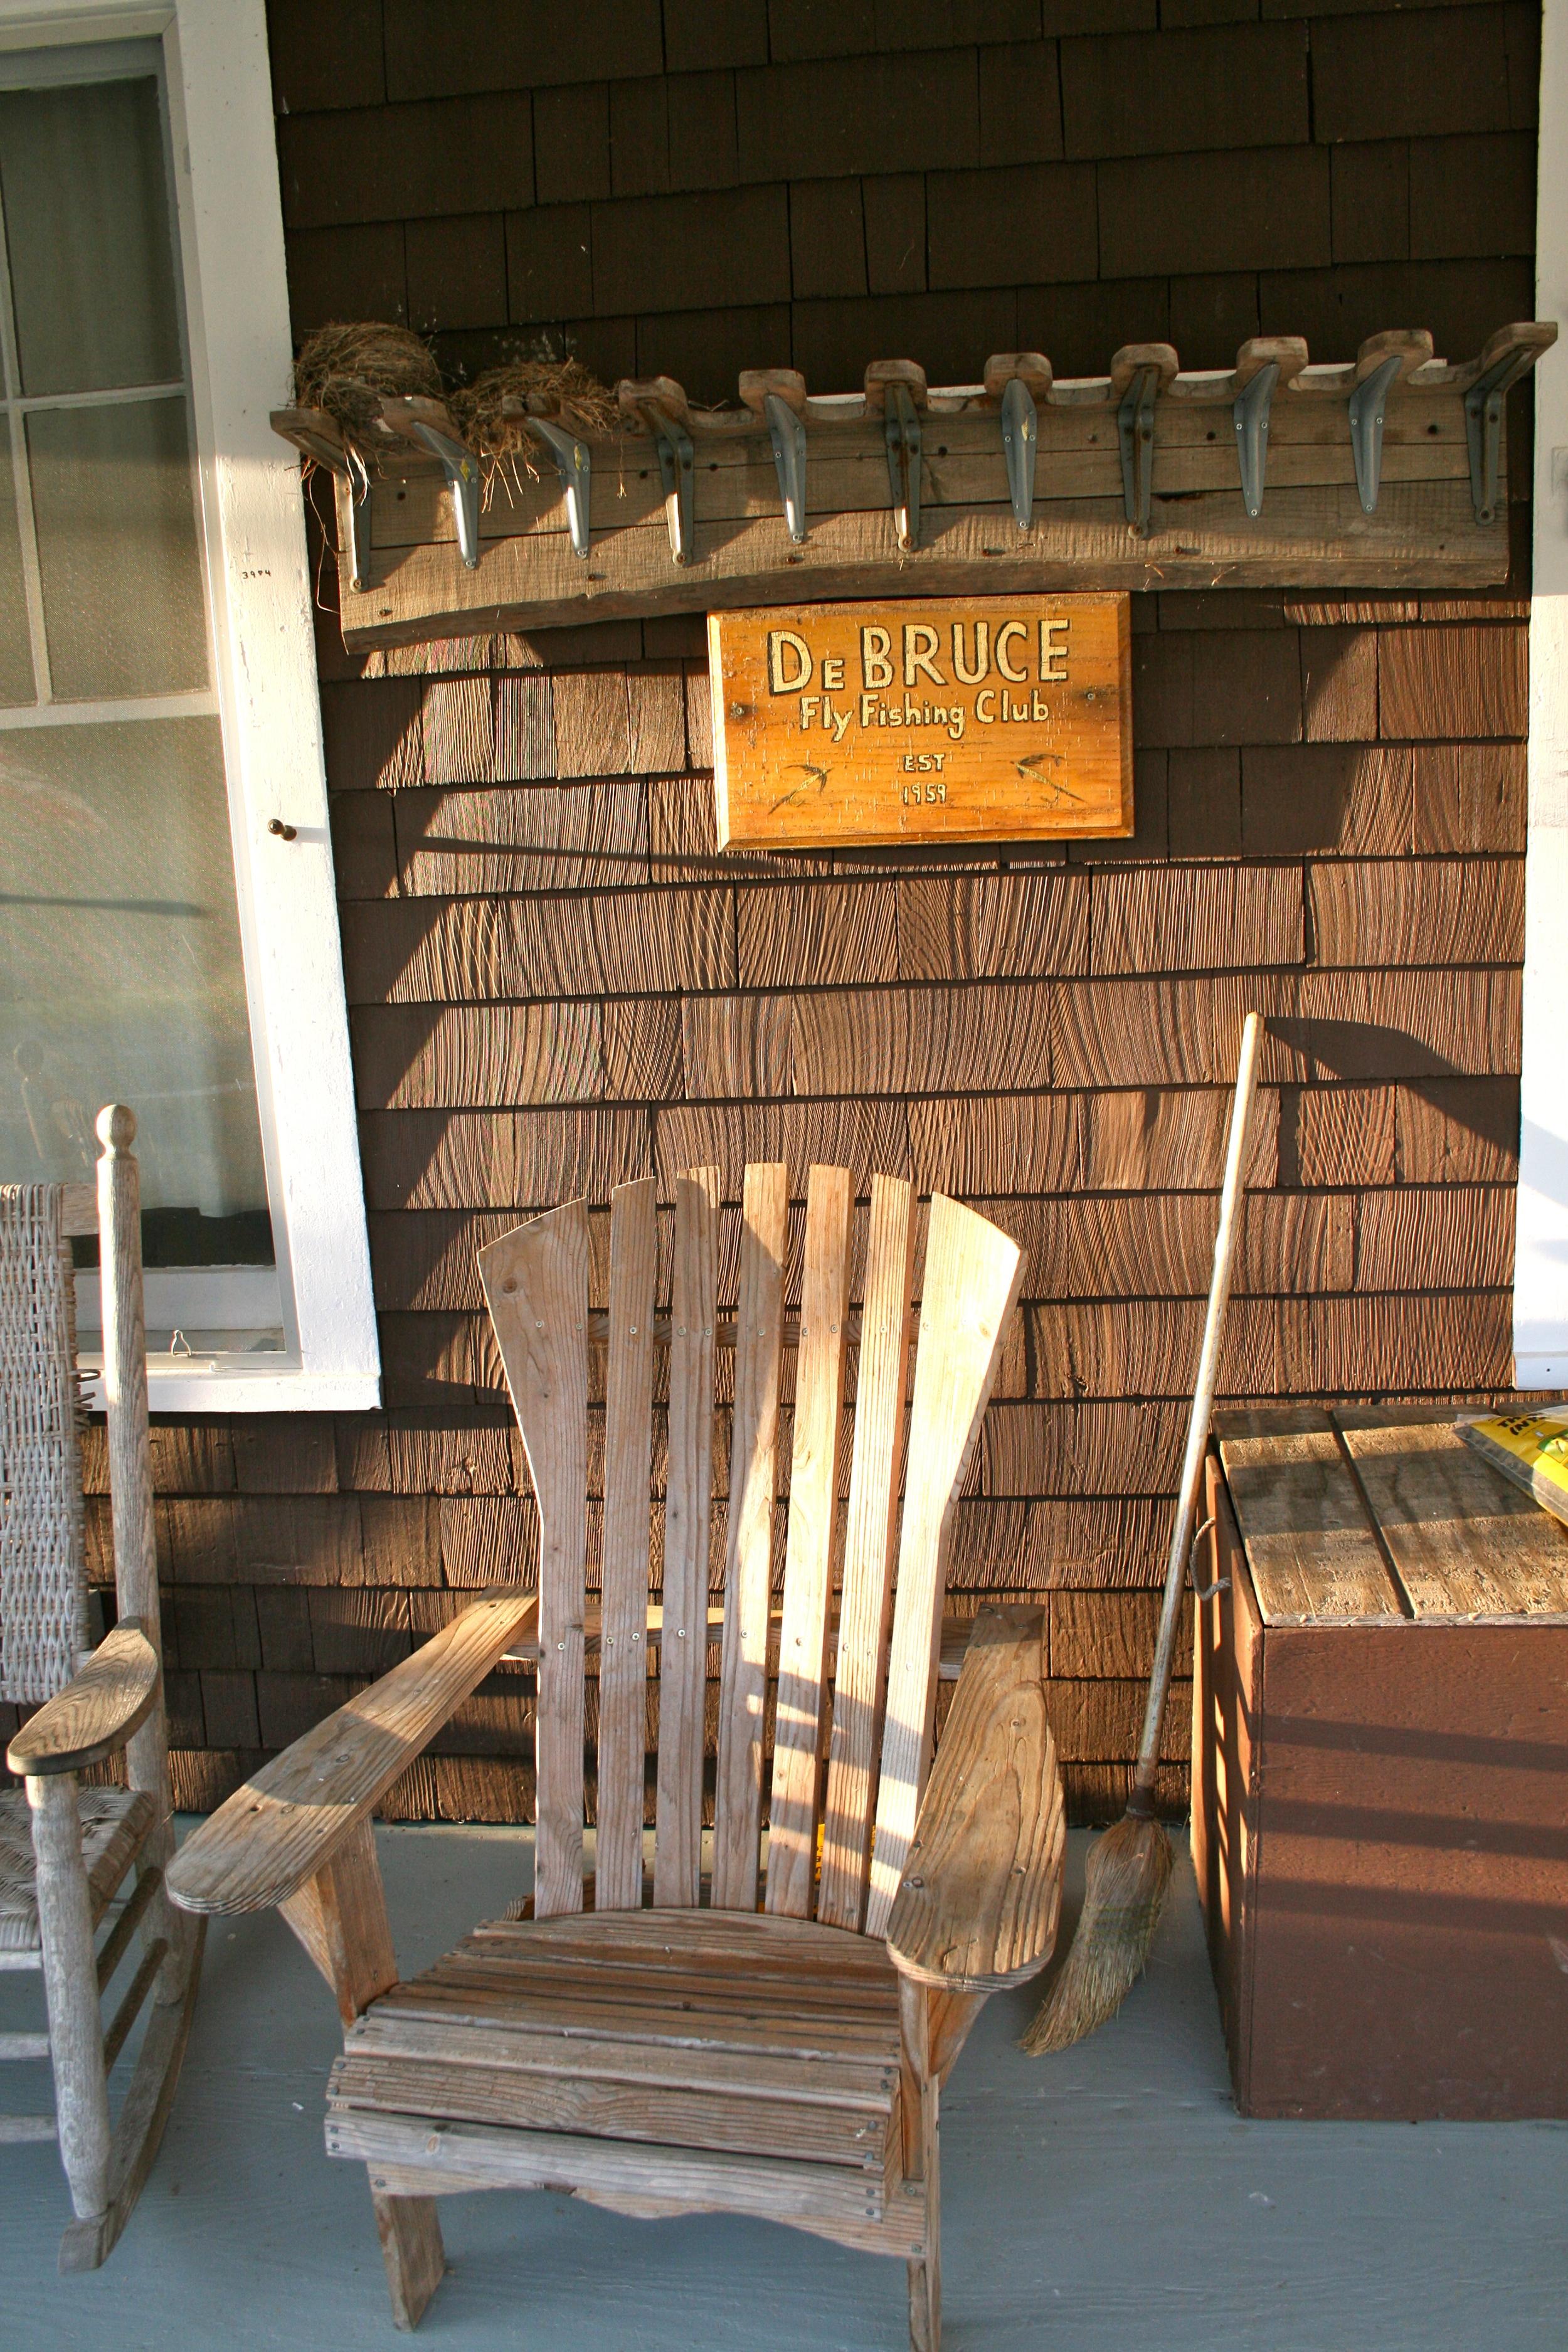 The DeBruce Fishing Club